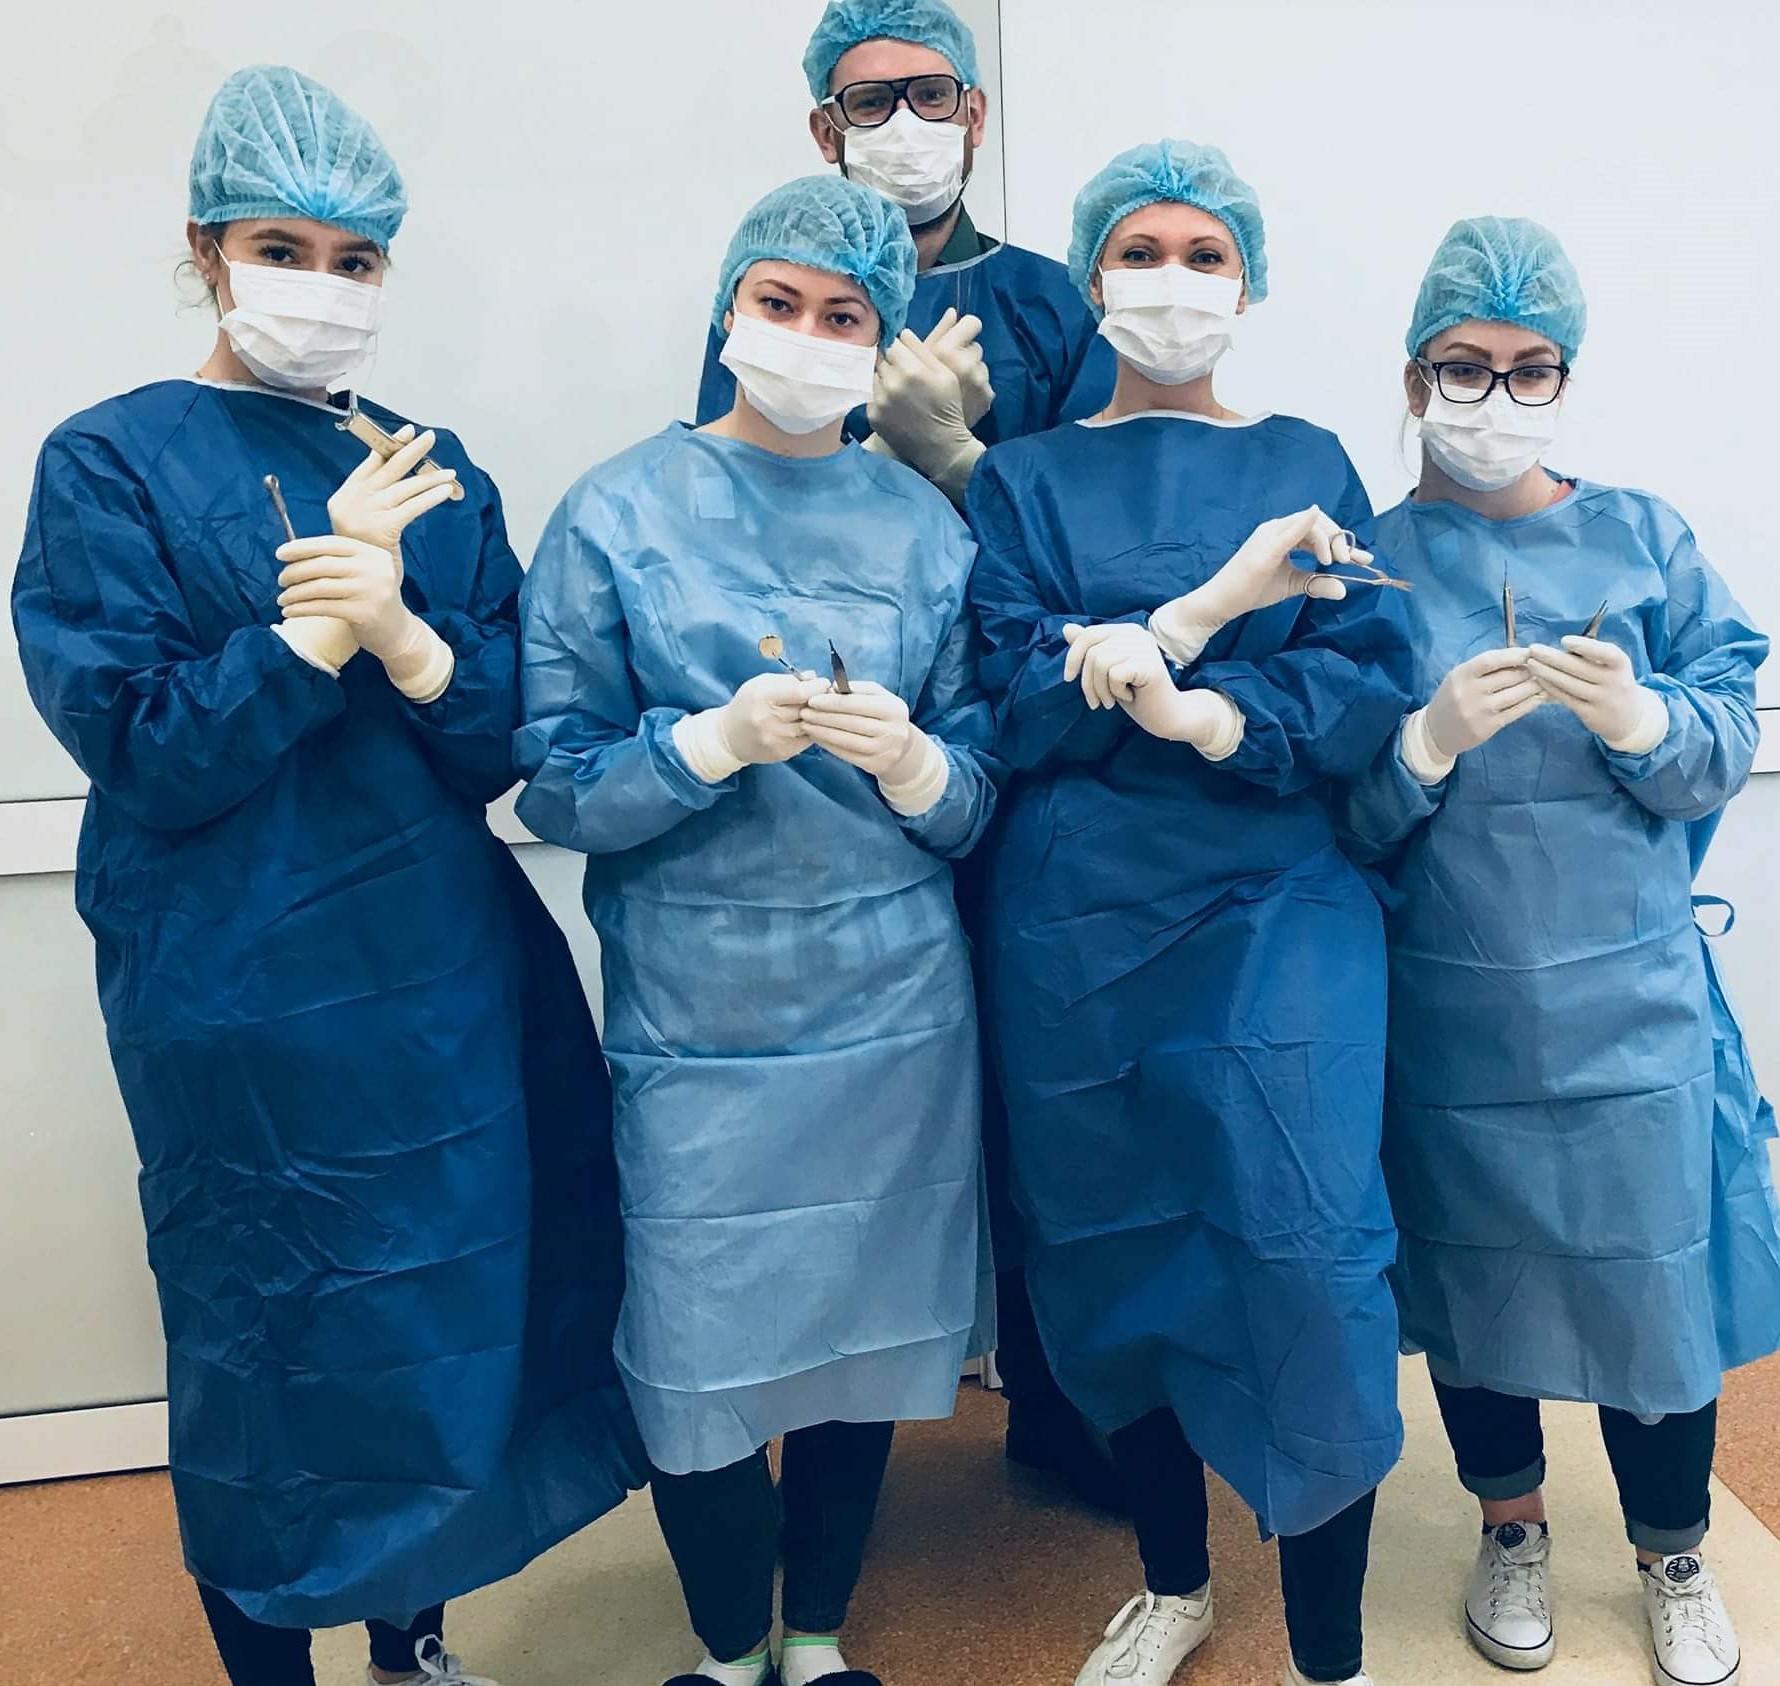 asysta implantologiczna